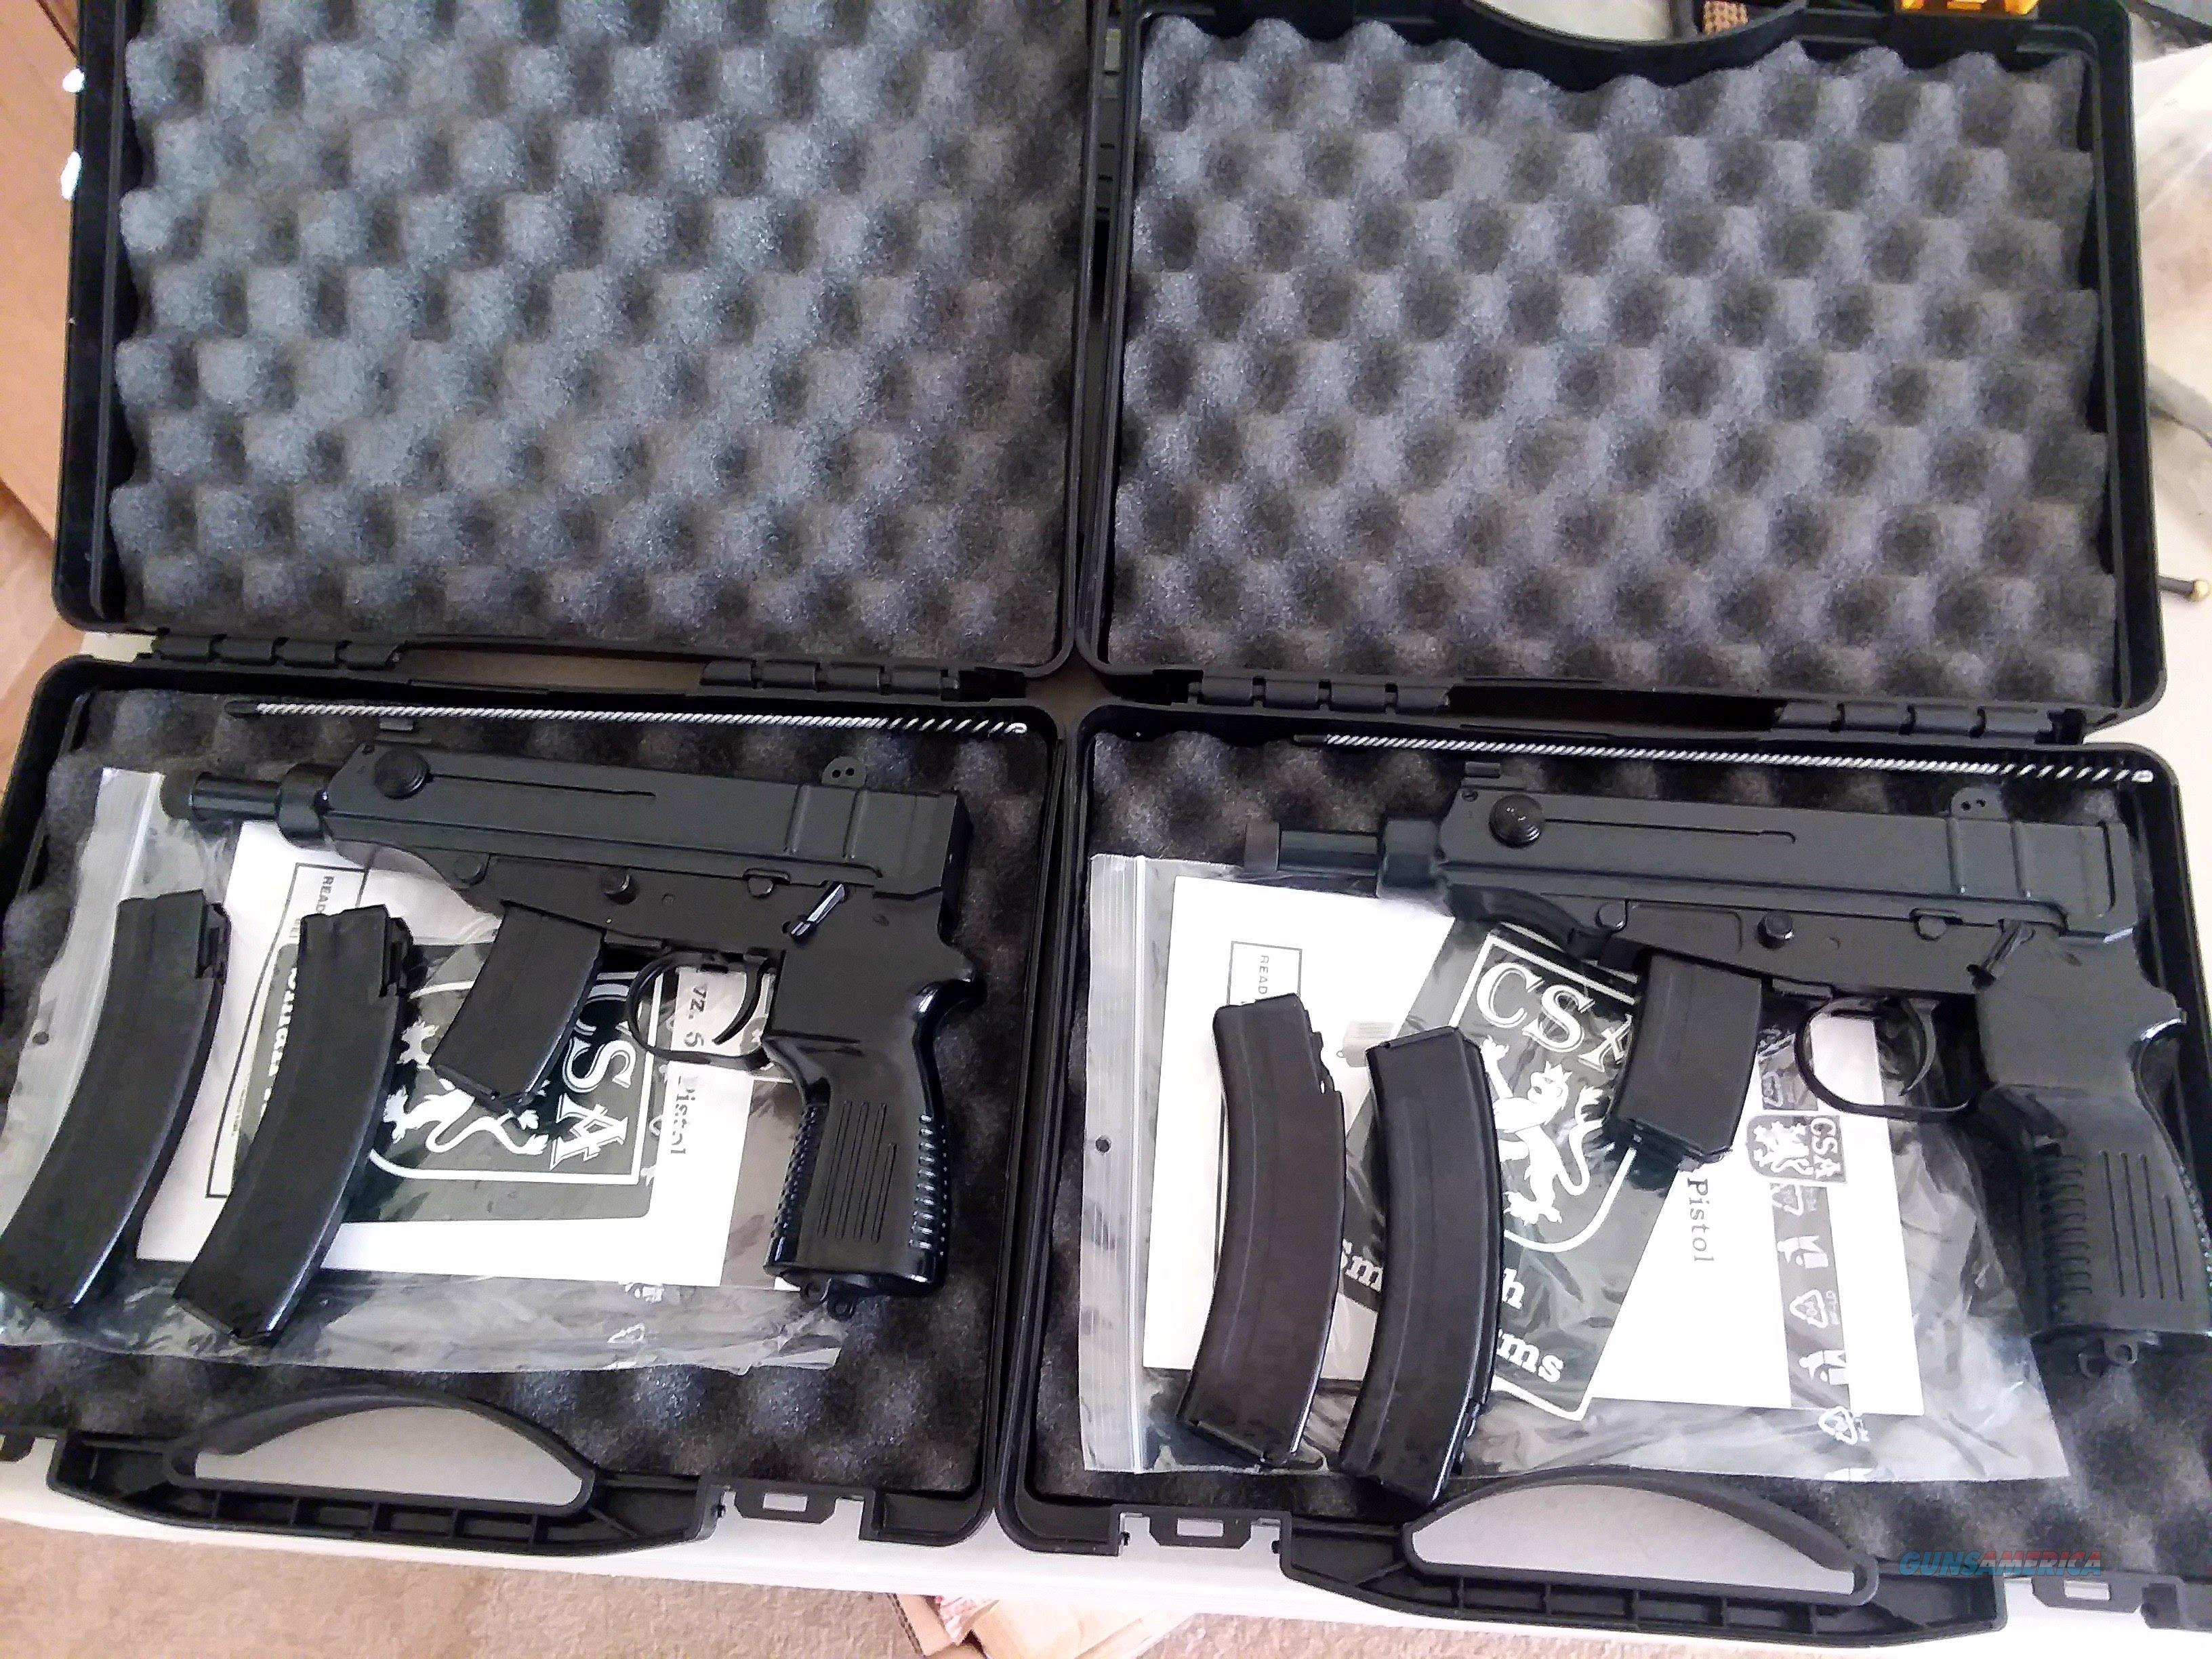 NEW Vz61 CZ  32 ACP Scorpion pistol threaded barrel czechpoint vz 61